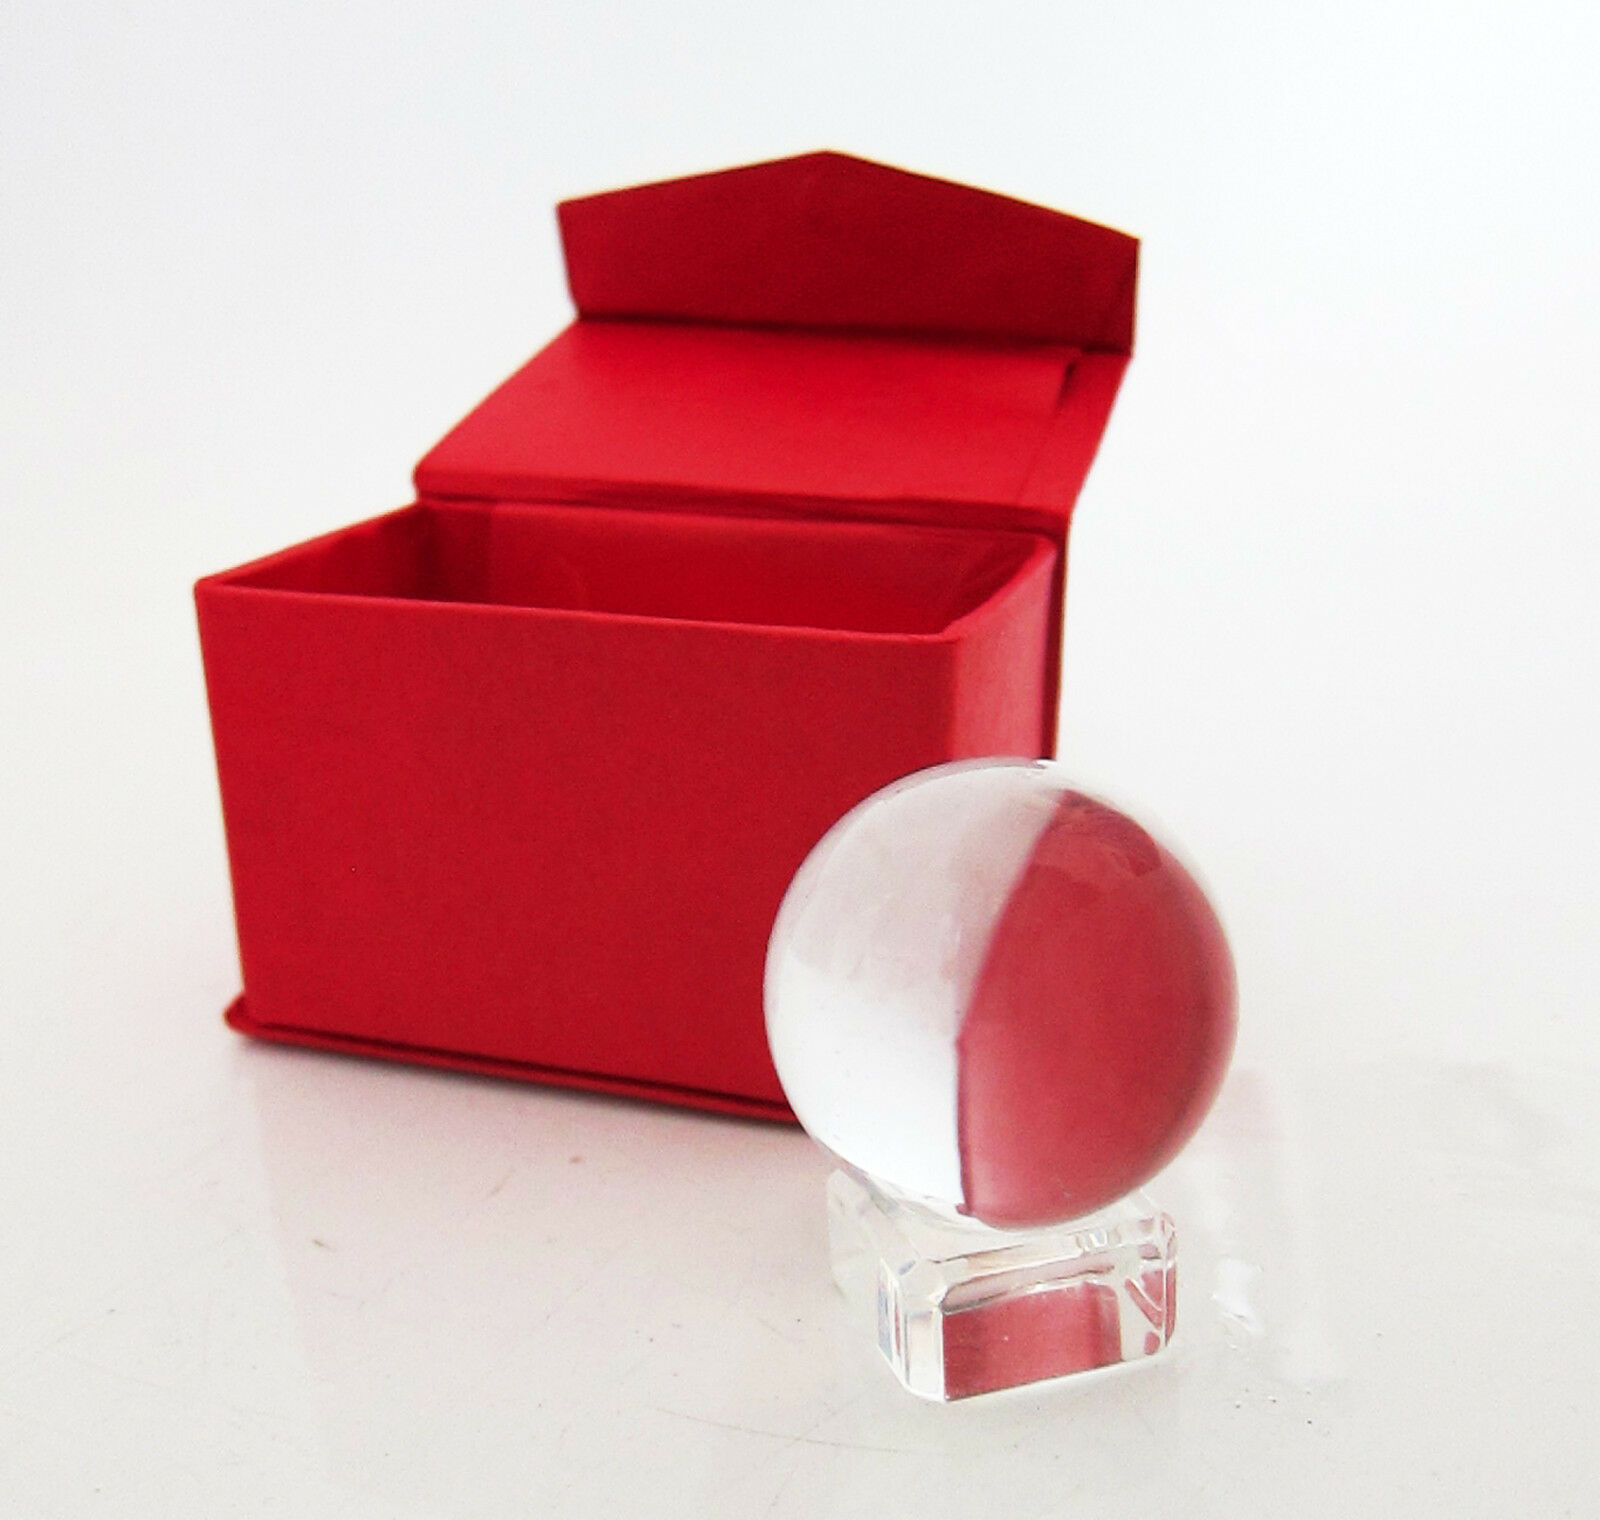 30mm Feng Shui Crystal Glass Ball Граненый хрустальный шар диаметр 30 мм